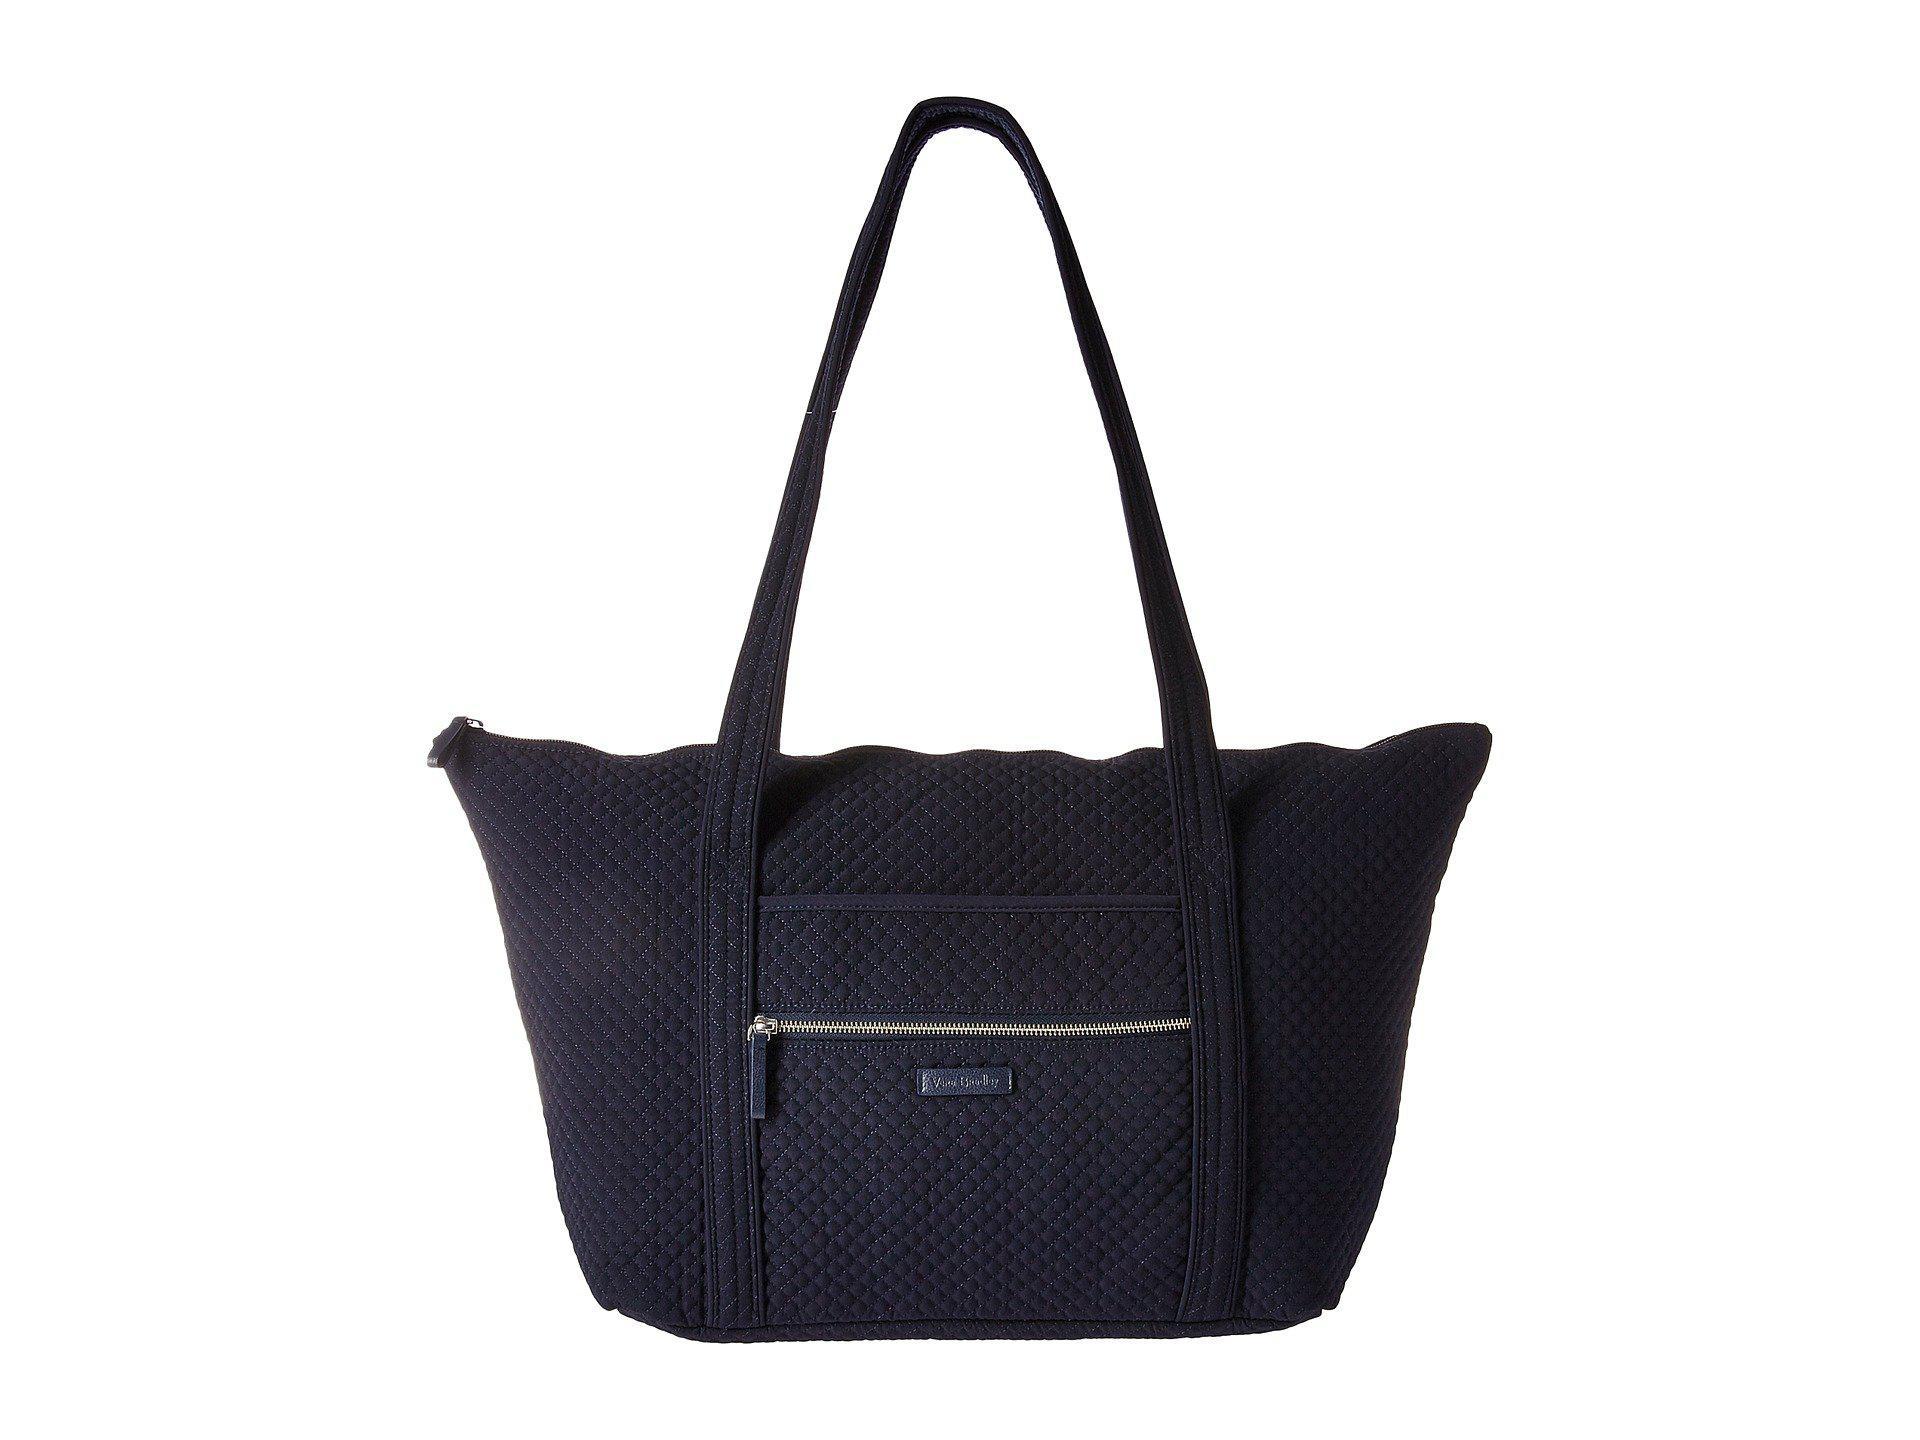 7a02c7abd1 Lyst - Vera Bradley Iconic Miller Travel Bag (bahama Bay) Luggage in ...